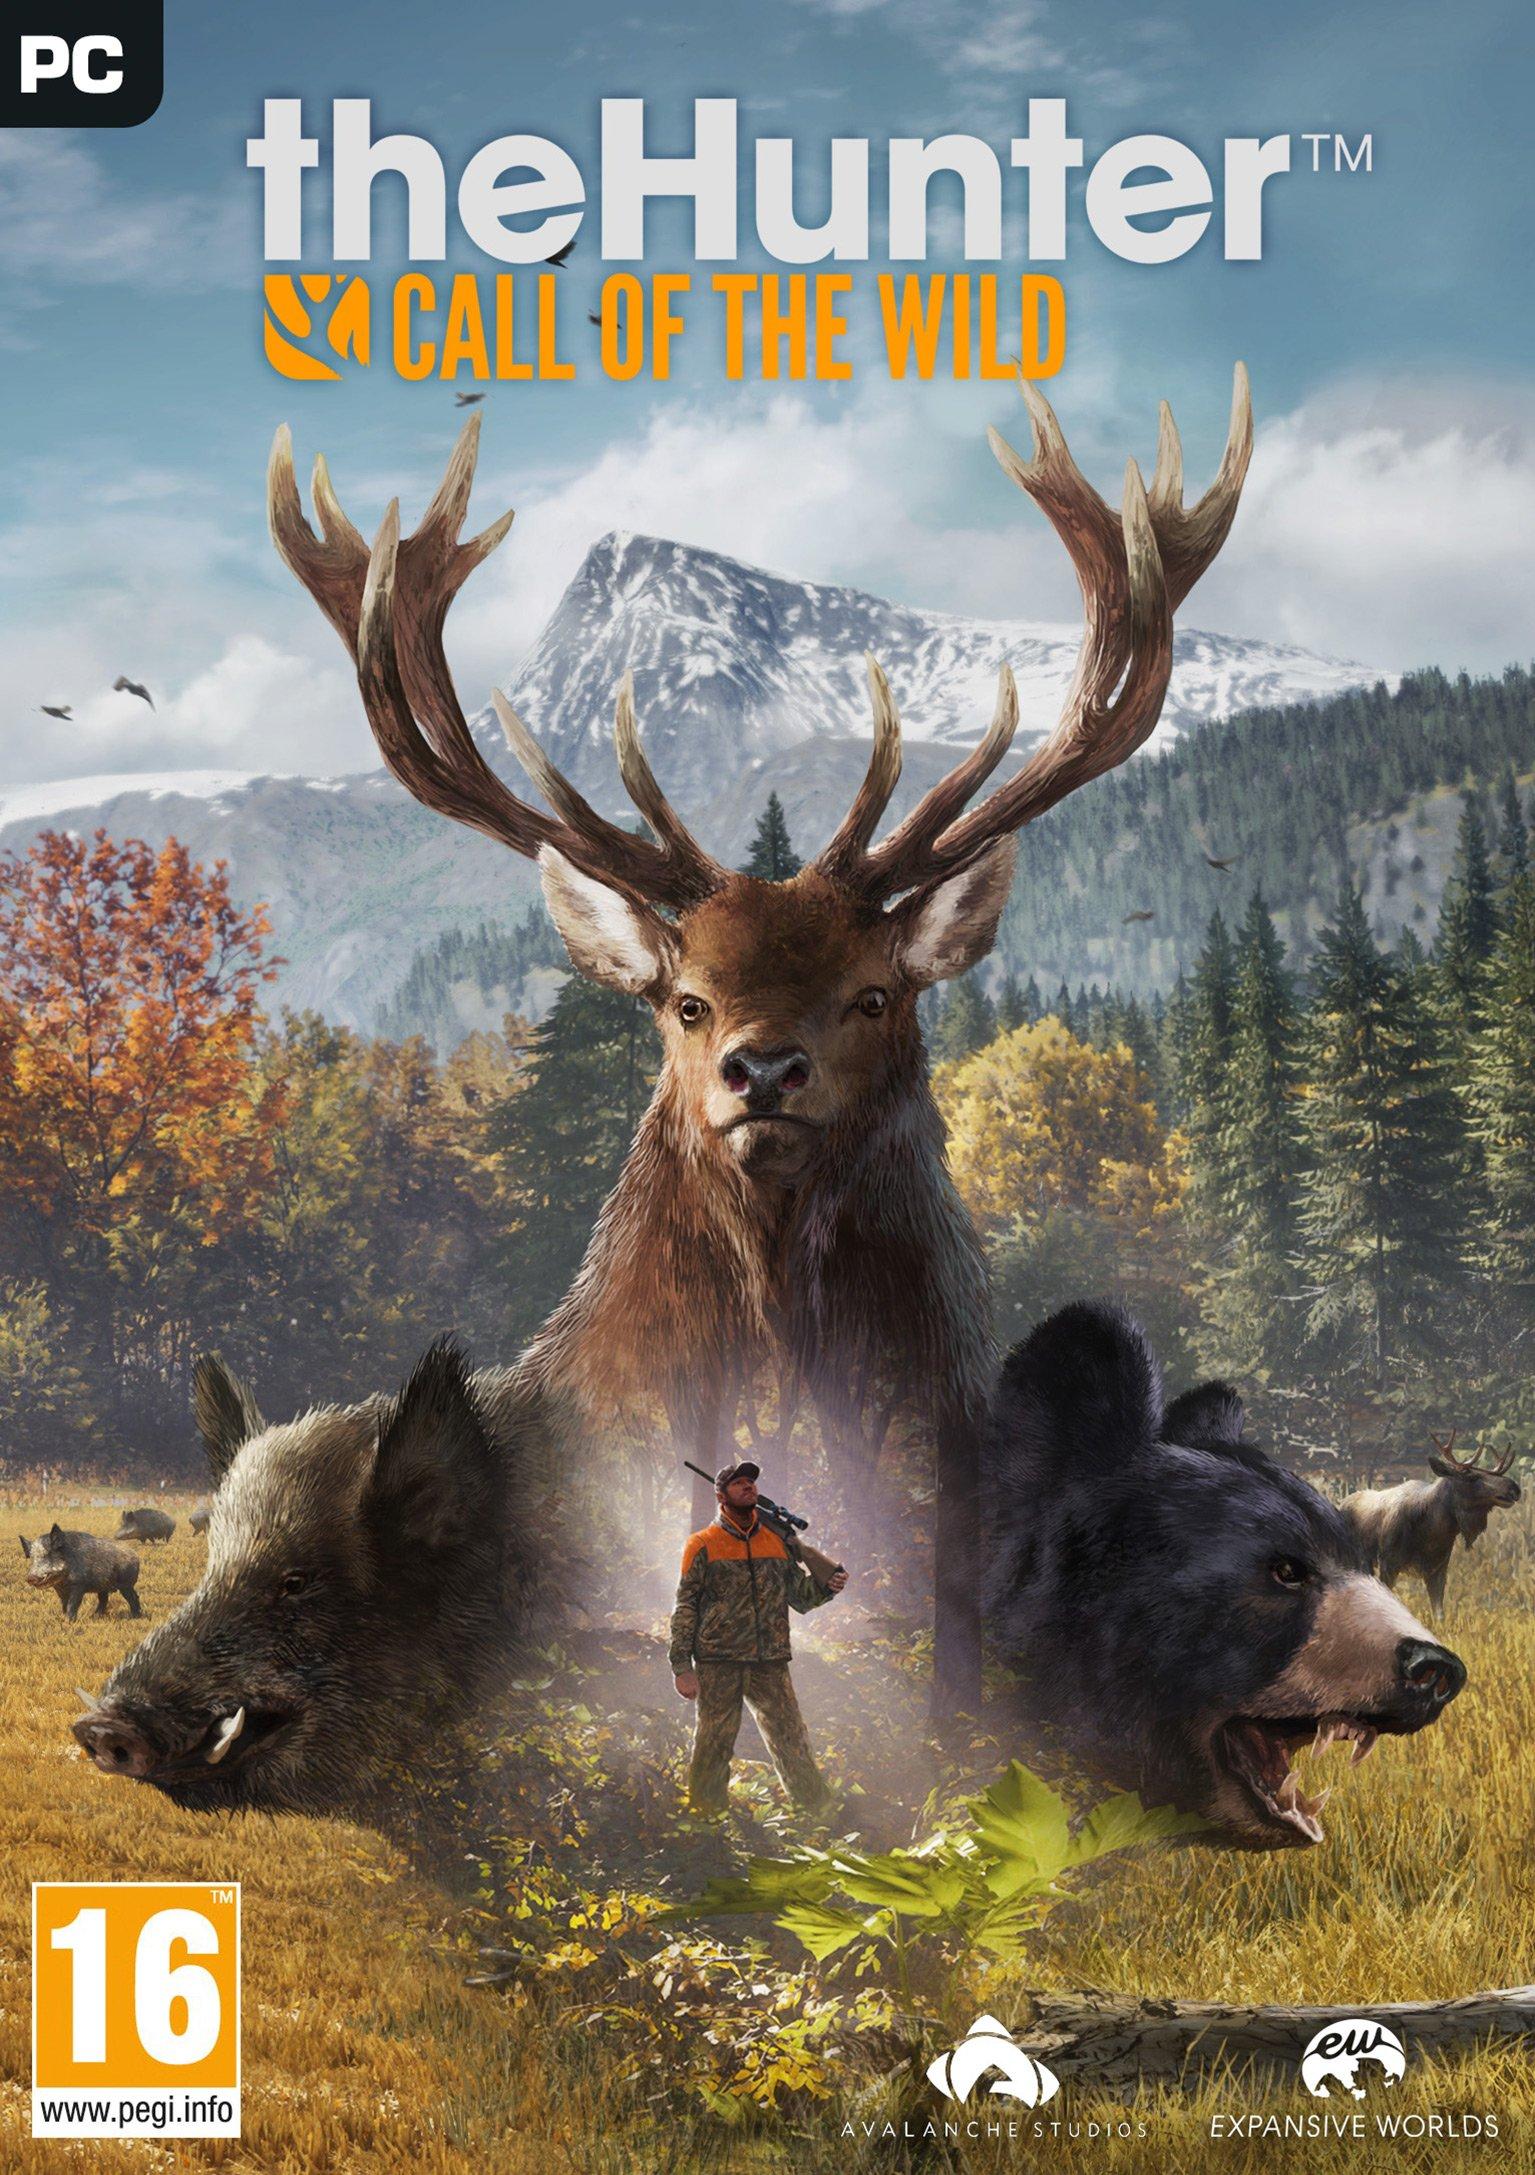 TheHunter: Call of the Wild [v1939208 +DLC] (2017) RePack от R.G. Механики